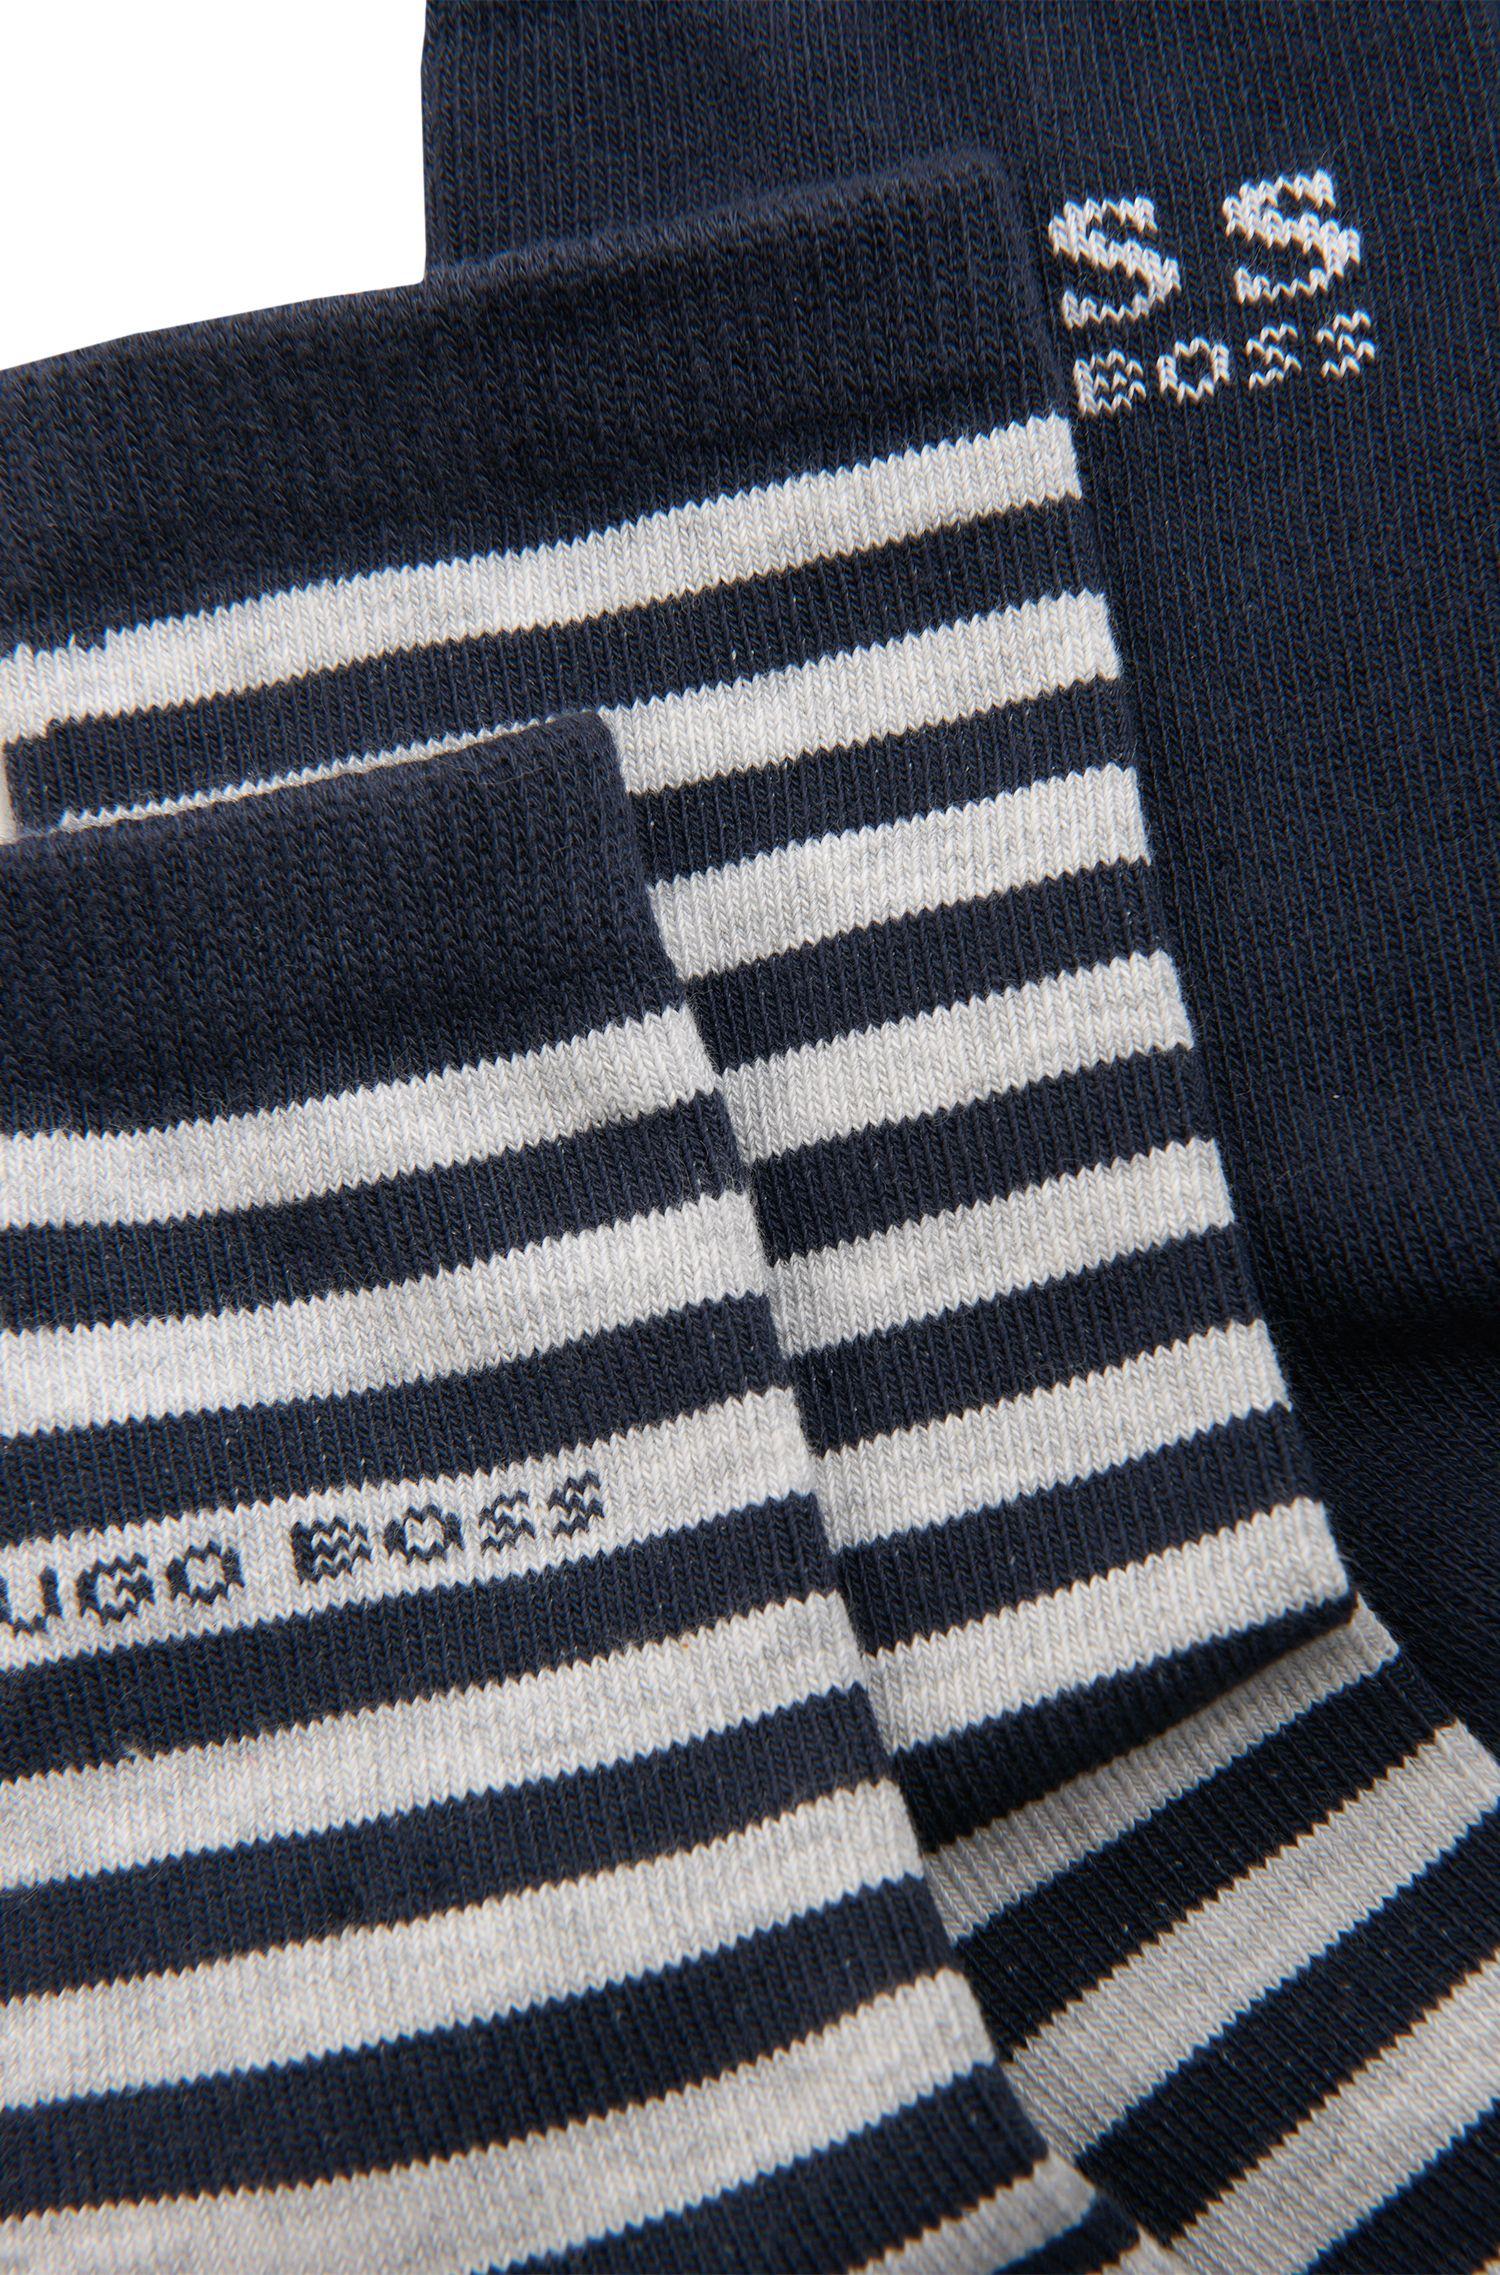 Kids-Socken aus Baumwoll-Mix im Zweierpack: 'J20183'